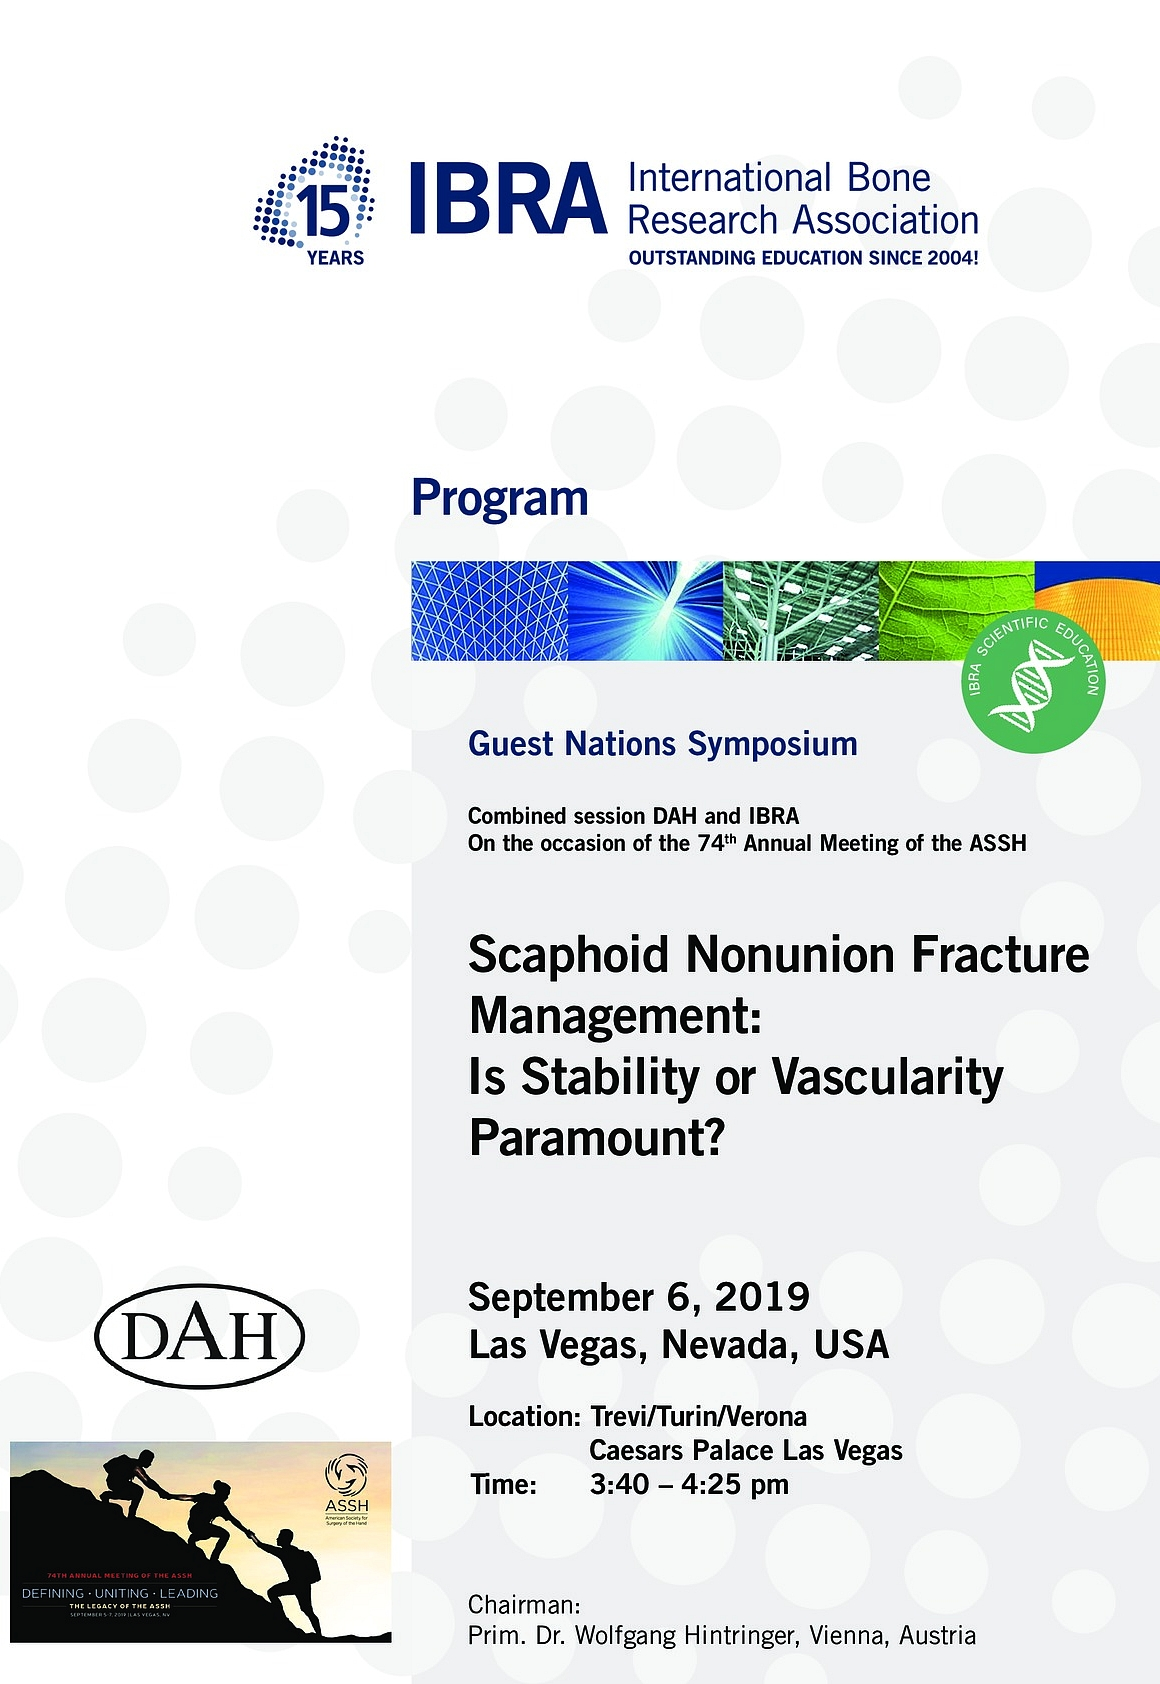 Guest Nations Symposium: Scaphoid Nonunion Fracture